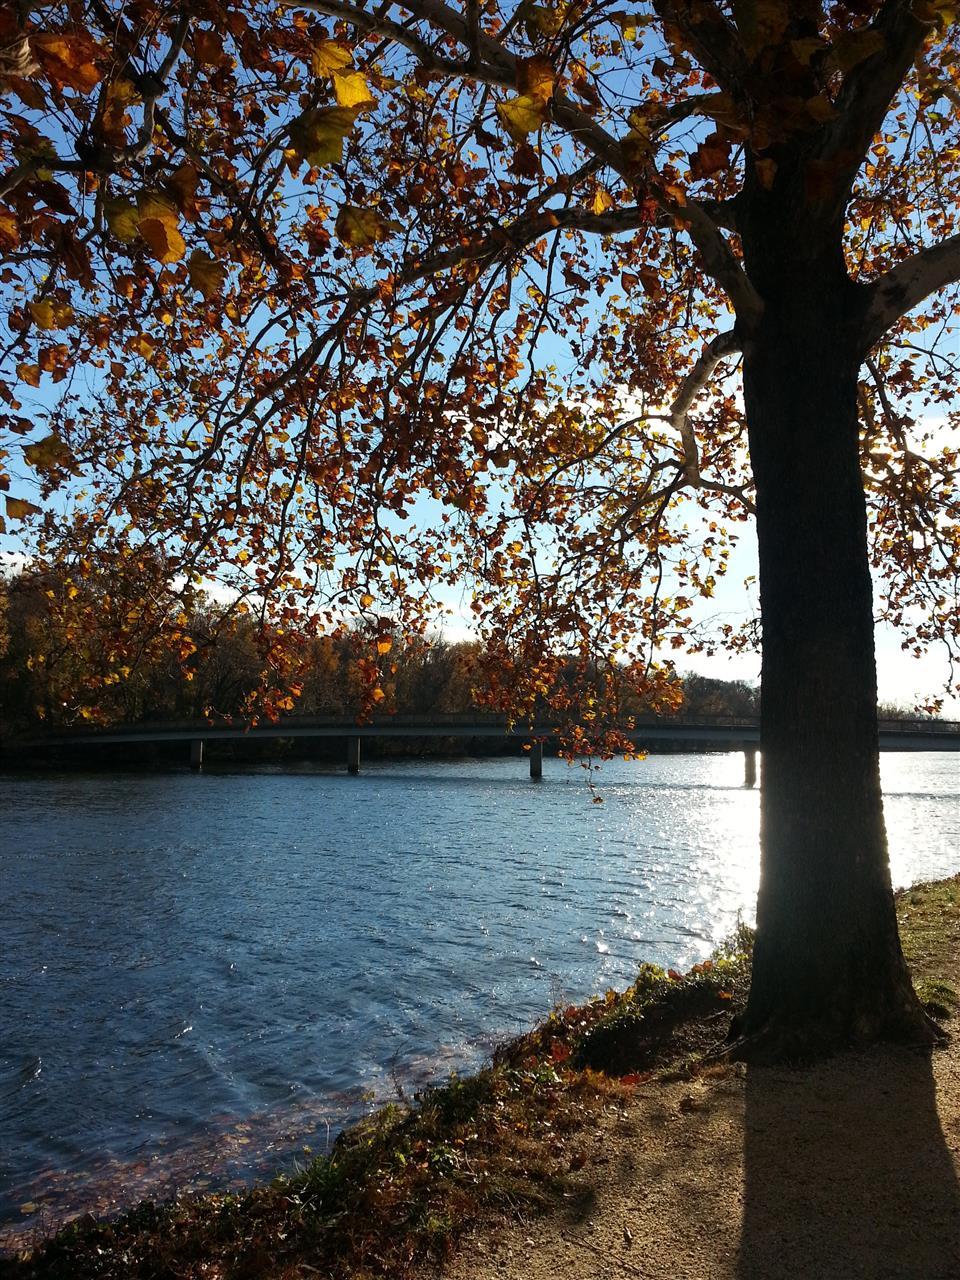 Theodore Roosevelt Island Bridge,  taken from Arlington, VA